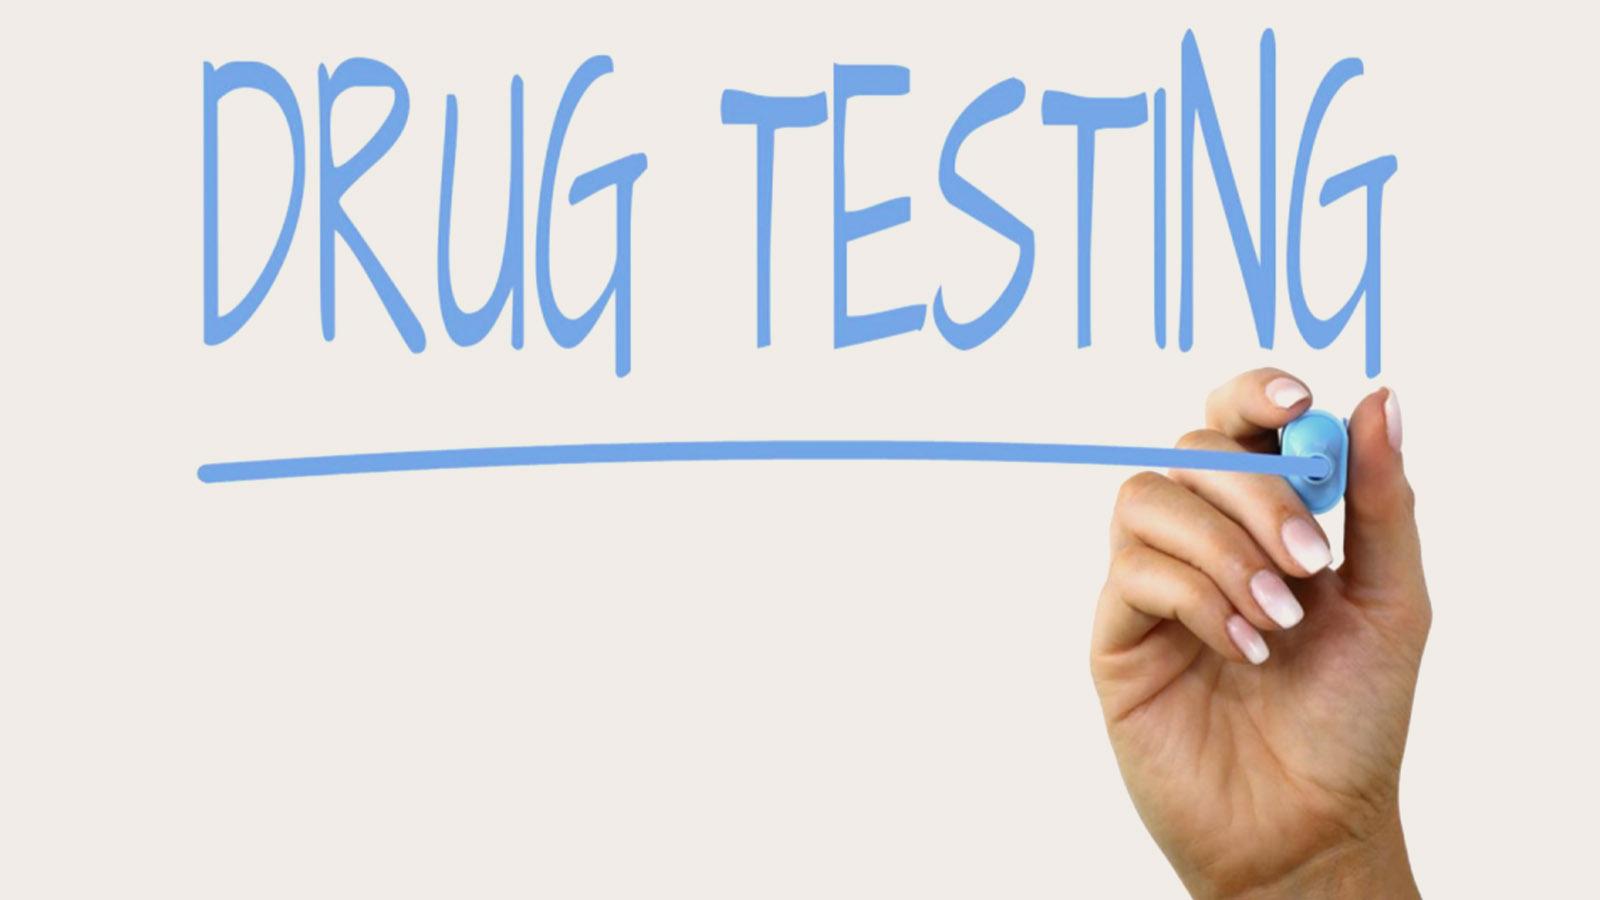 State Drug Testing Laws